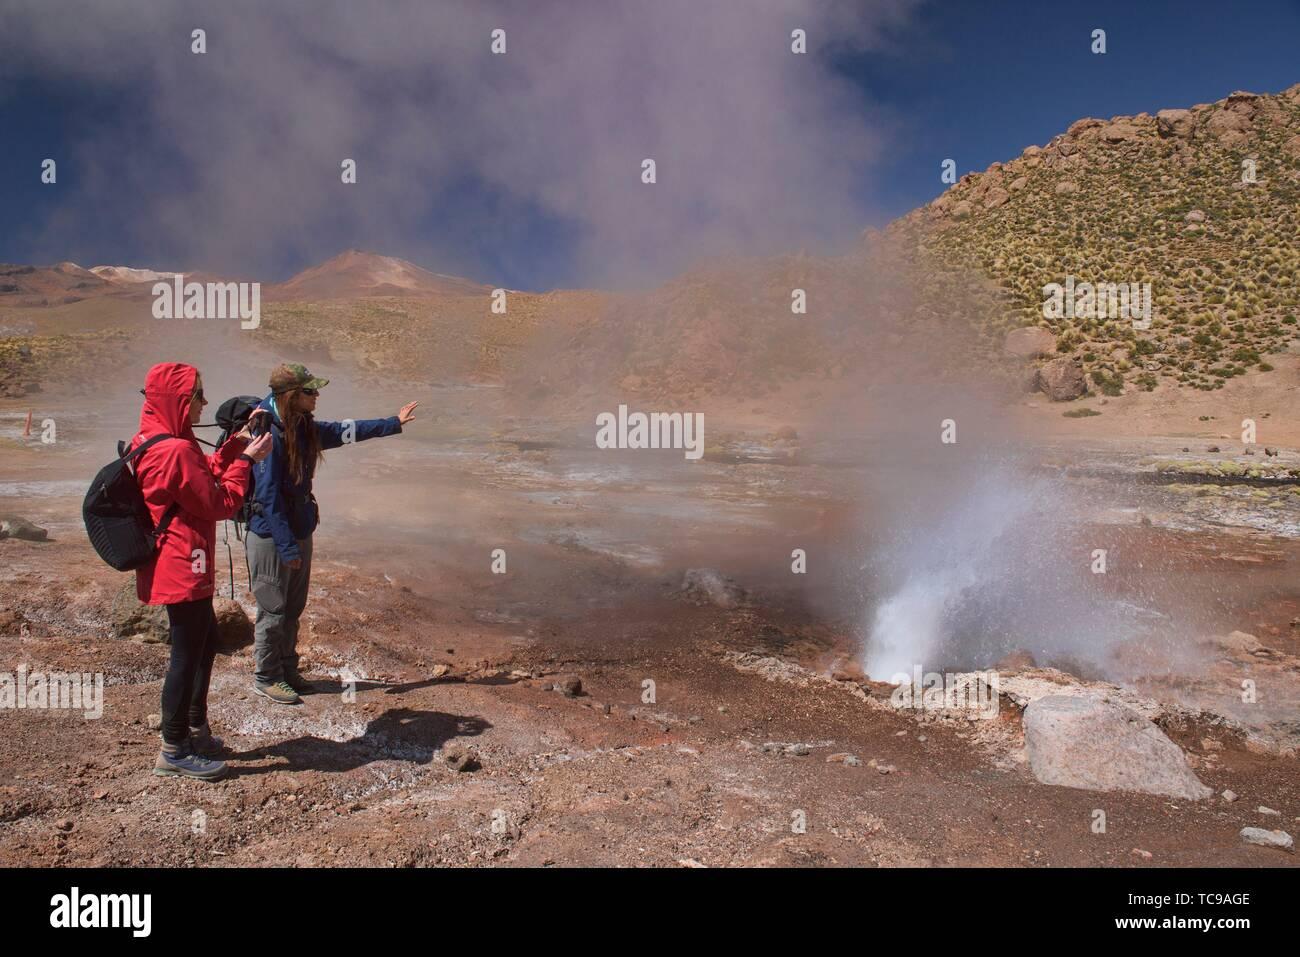 Watching a geyser erupt along the Rio Blanco, El Tatio, San Pedro de Atacama, Chile. Stock Photo